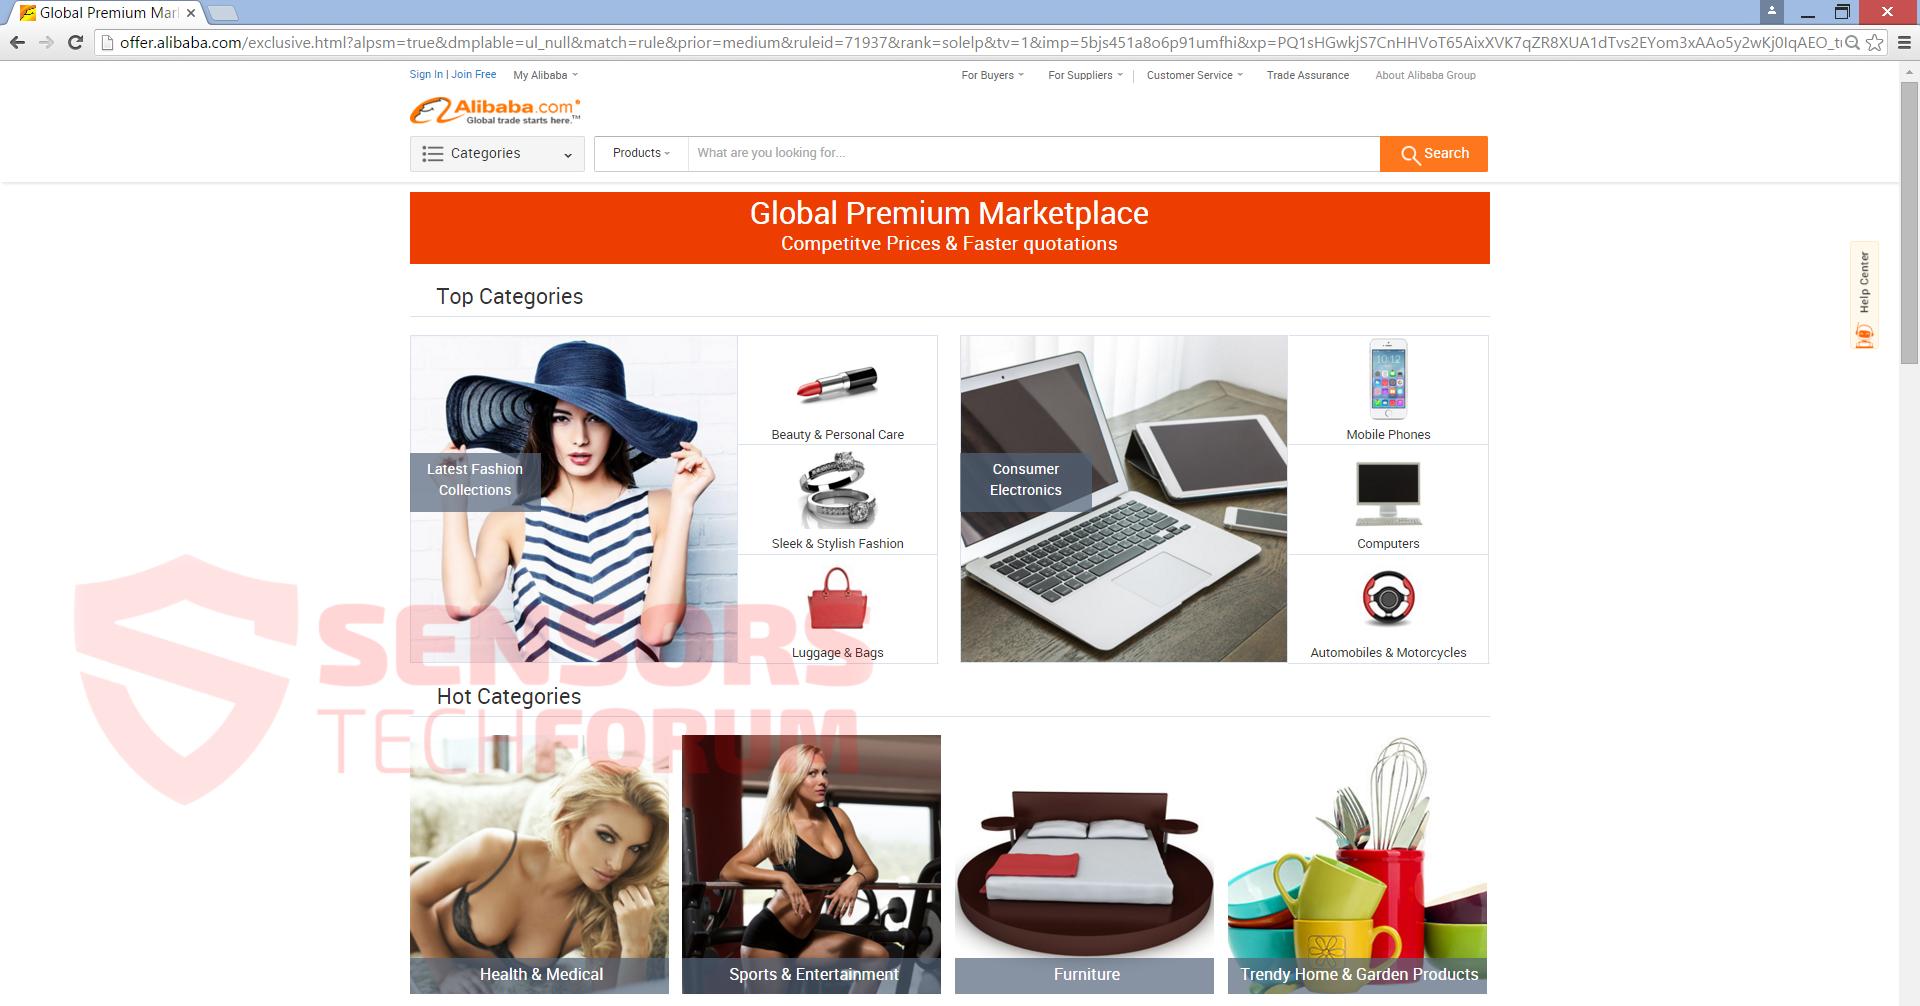 STF-wonderlandads-com-wonderland-ads-offer-alibaba-redirect